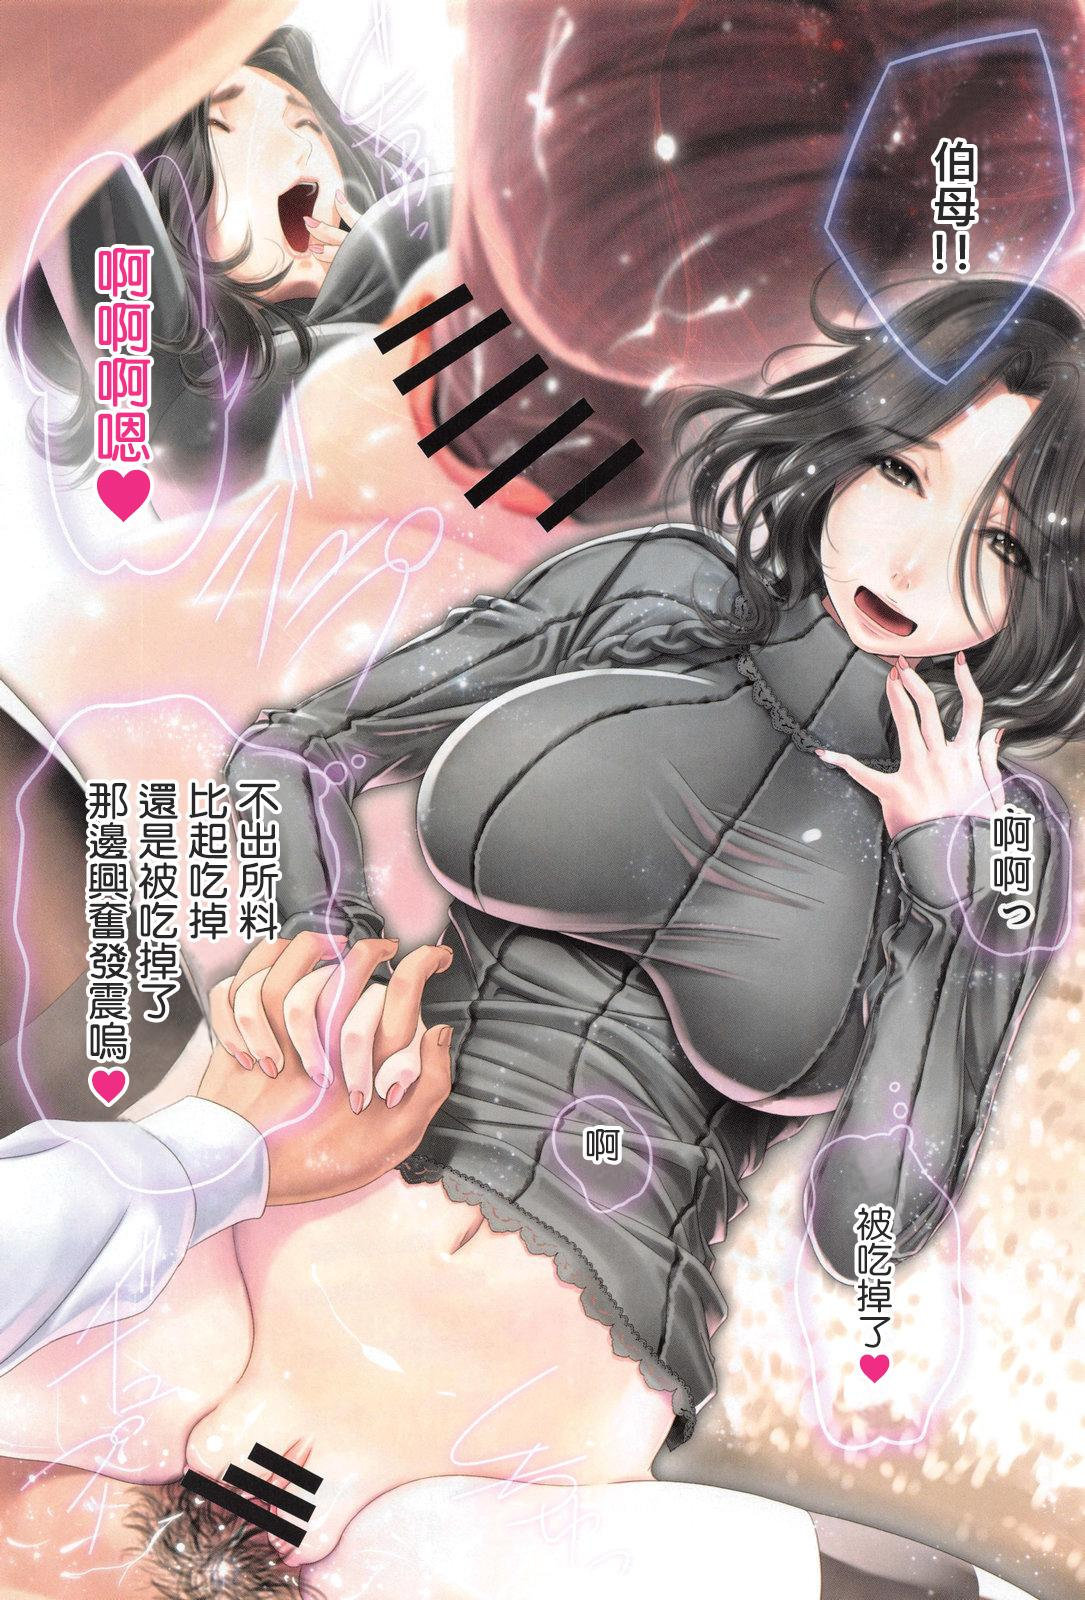 Shirayuki Hime no Okaa-san 5